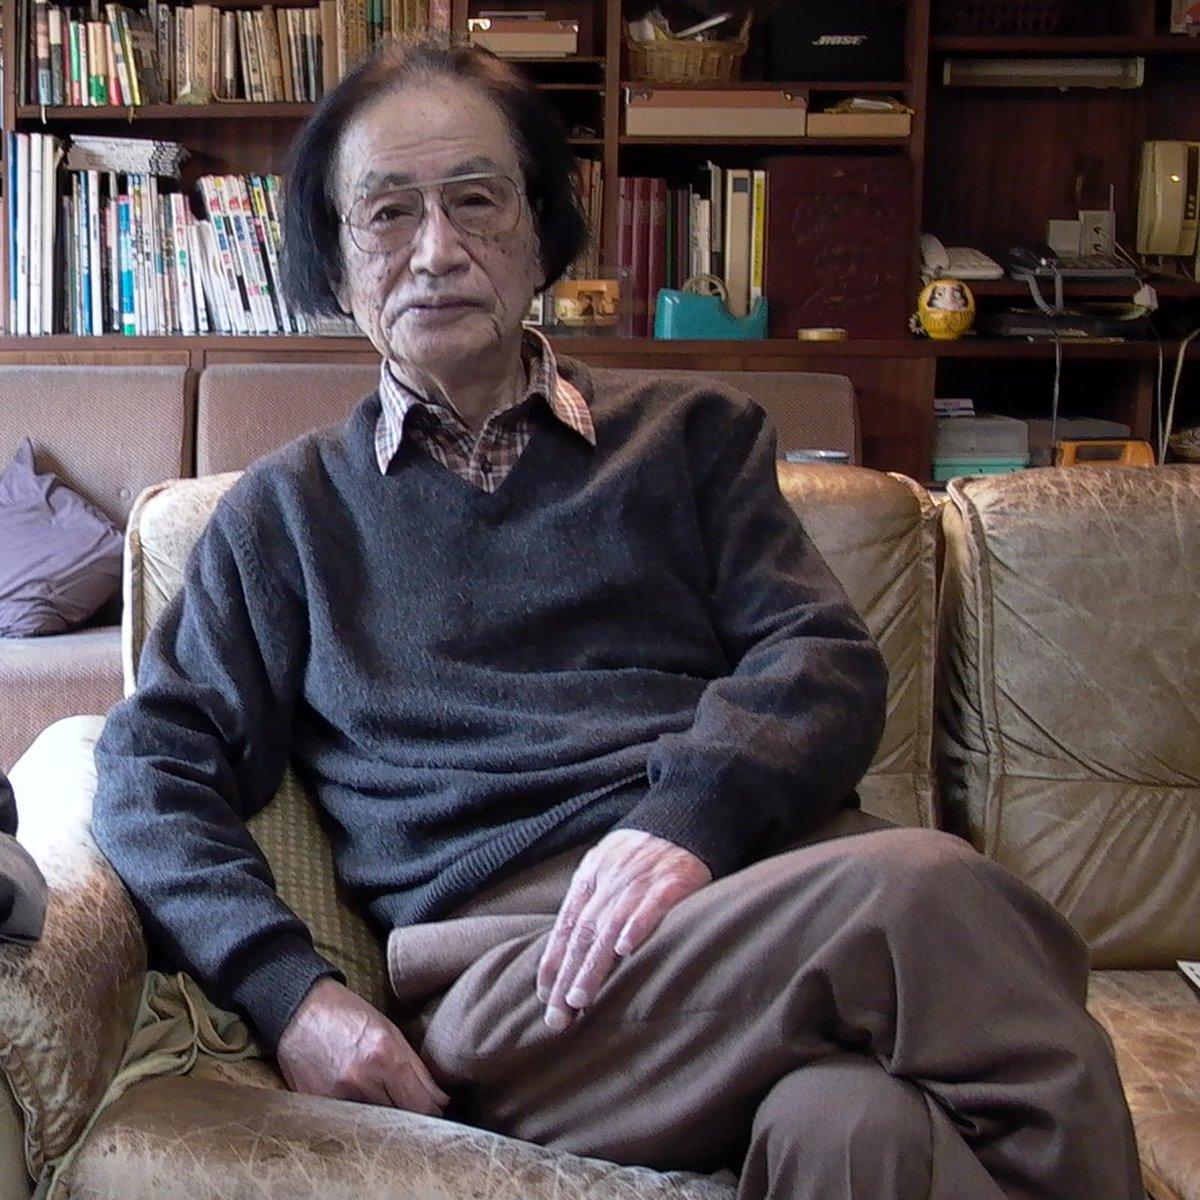 Shinobu Hashimoto wrote fucking RASHOMON, SEVEN SAMURAI, IKIRU, THRONE OF BLOOD, THE BAD SLEEP WELL & HIDDEN FORTRESS for Akiri Kurosawa. Plus HARAKIRI & SAMURAI REBELLION for Masaki Kobayashi. Not to mention the badass THE SWORD OF DOOM. A fucking titan died today. RIP.